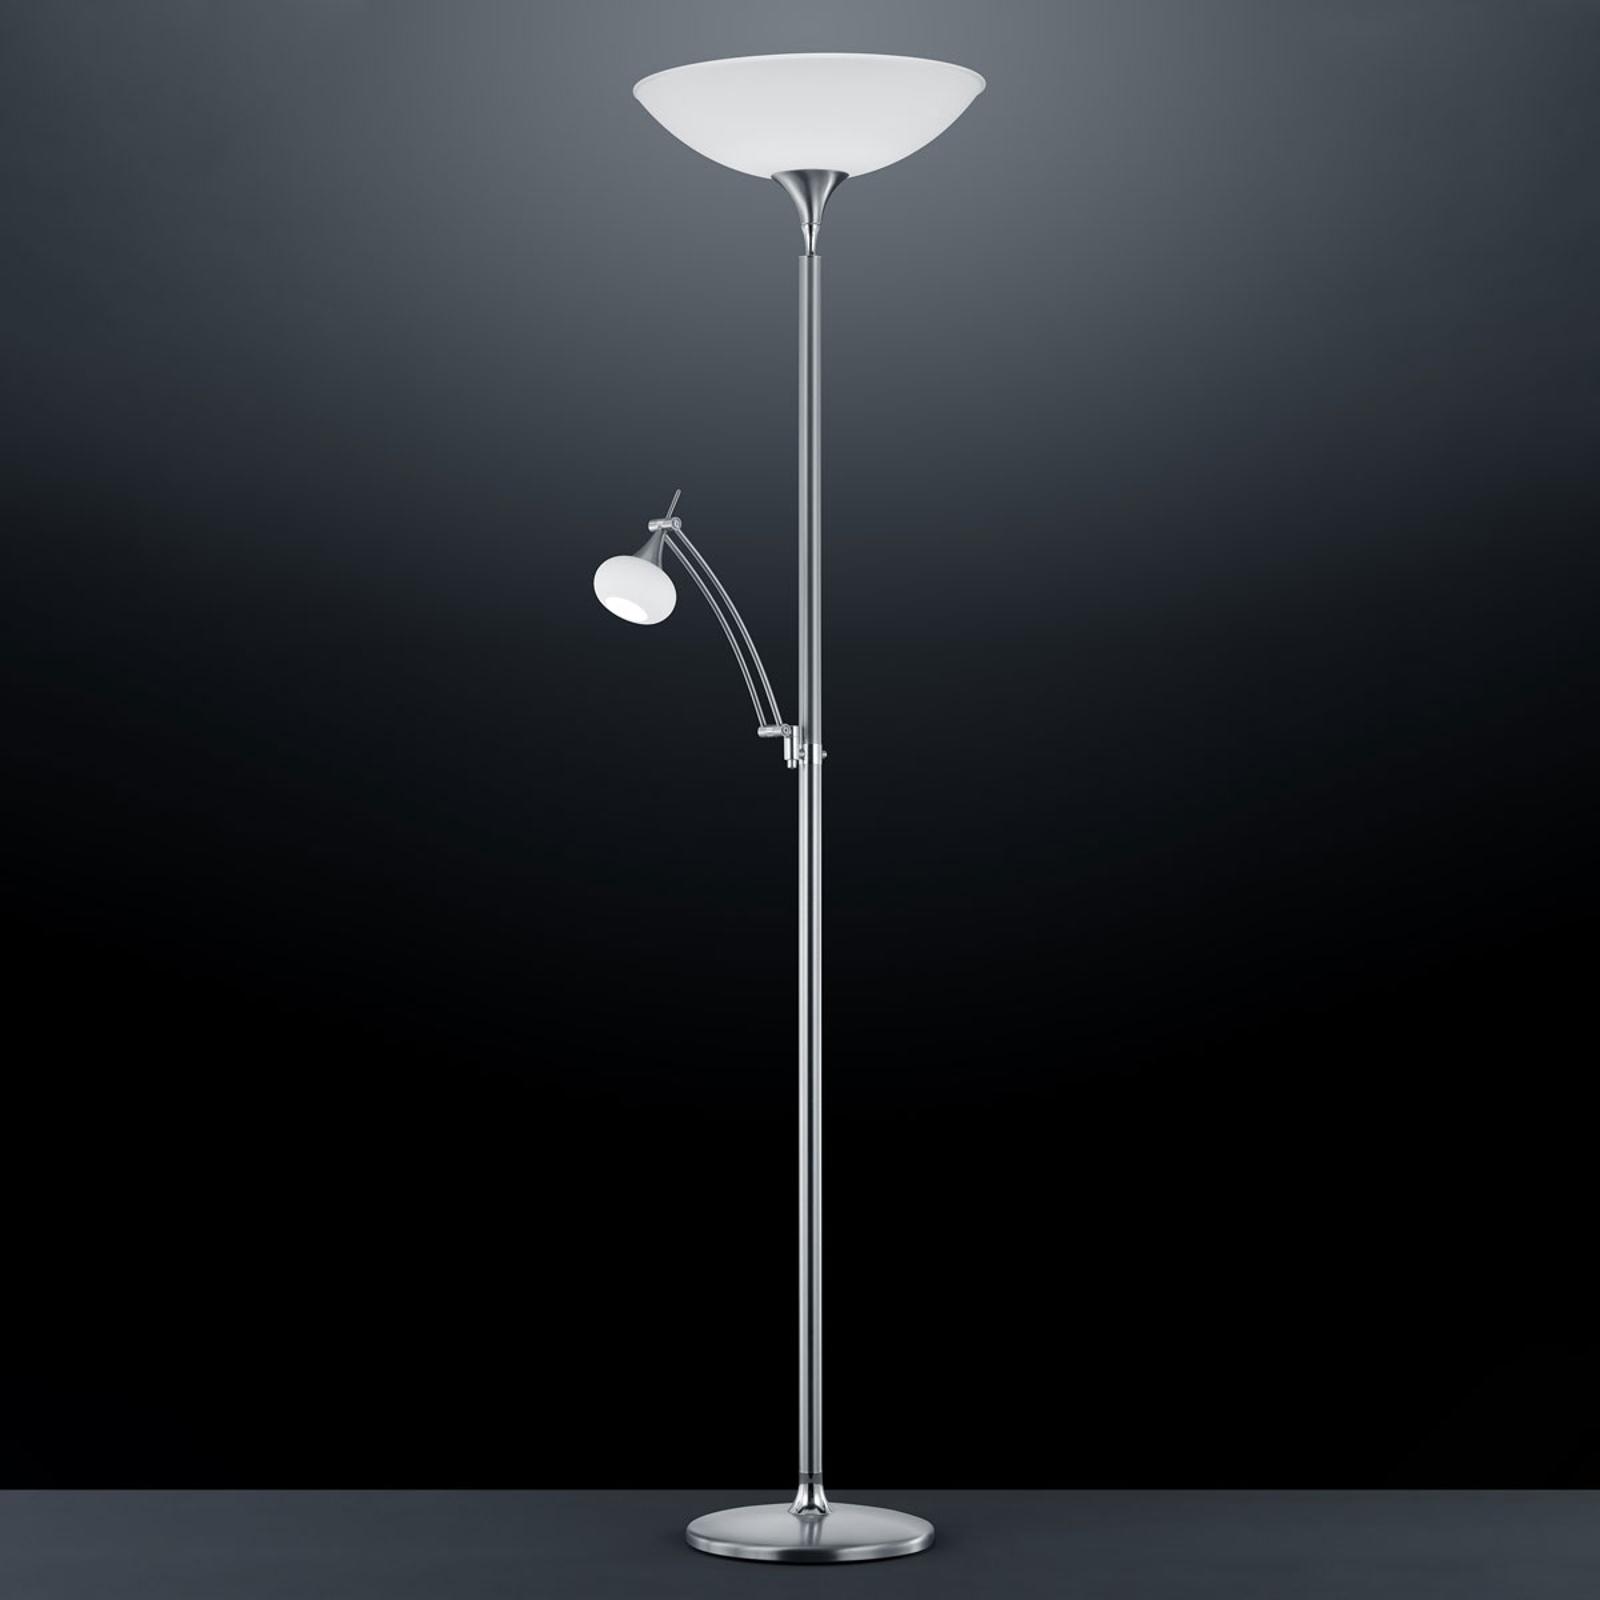 BANKAMP Opera lampa oświetlająca sufit ściemniana